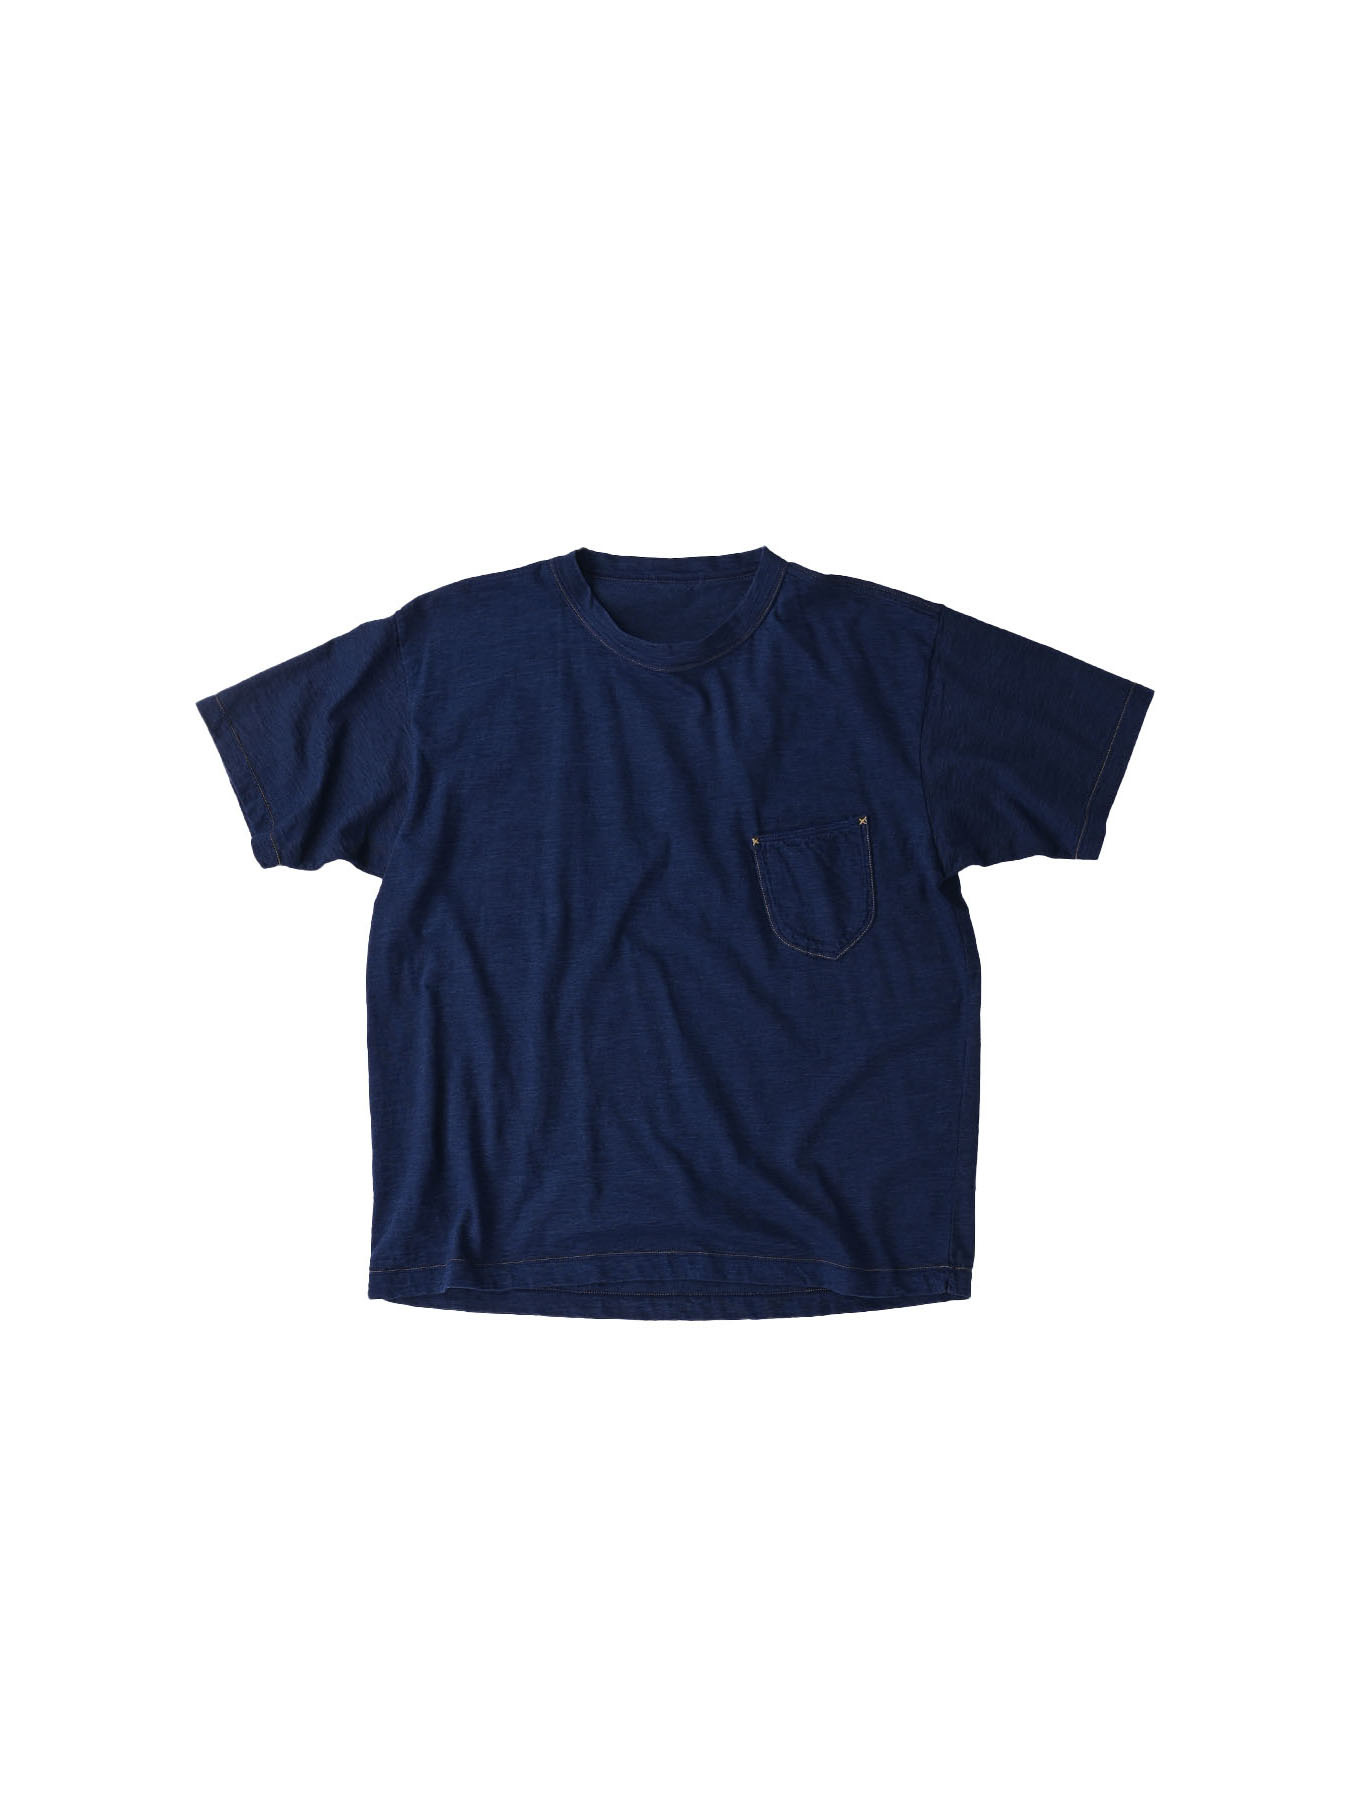 One Wash Indigo Tenjiku 908 Ocean T-Shirt (0621)-1